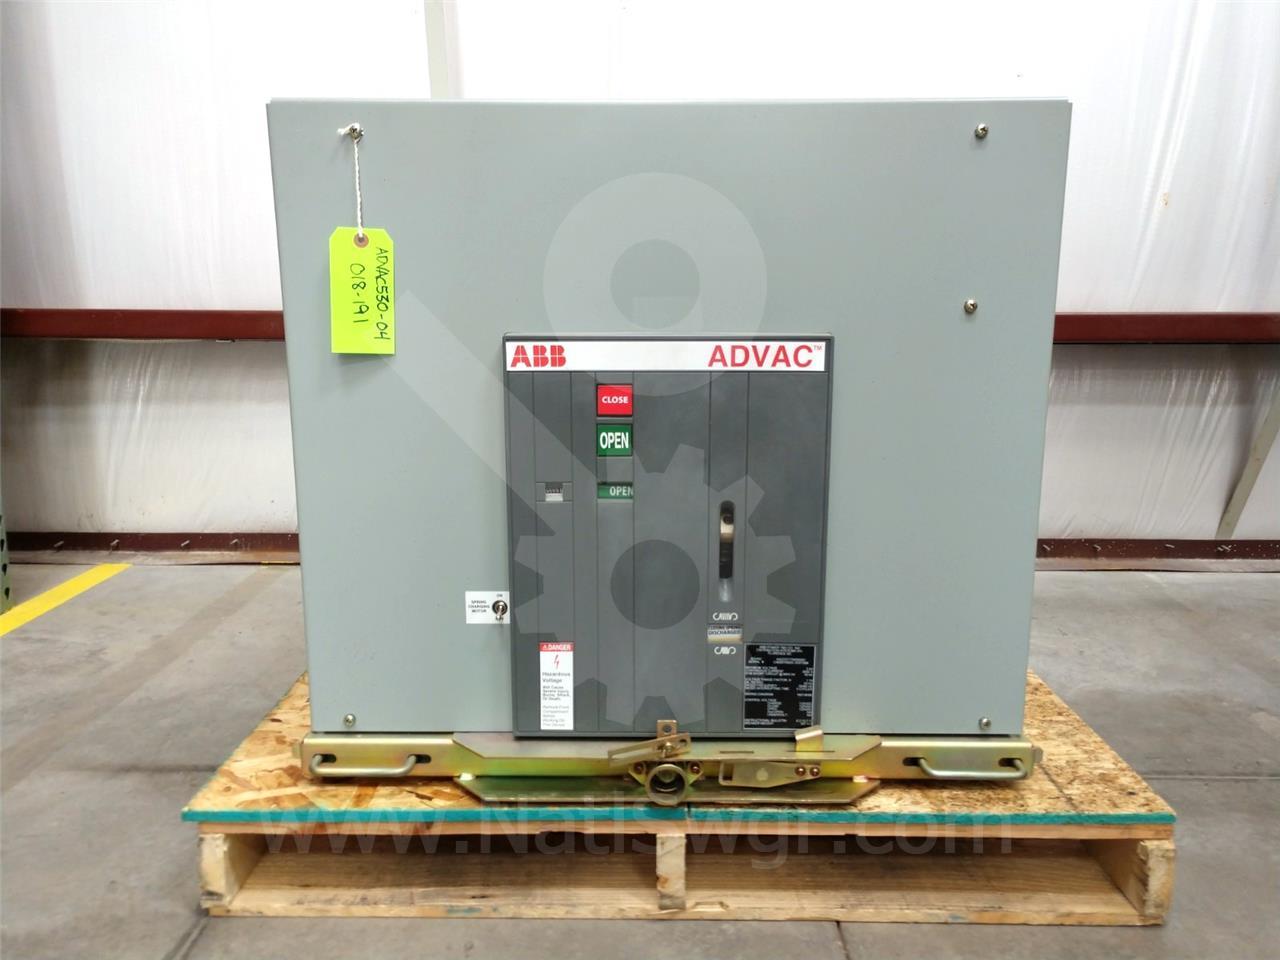 ABB / ITE / BBC 3000A ABB ADVAC AA223777000000C MODEL 2 (ADVAC MODEL 2)